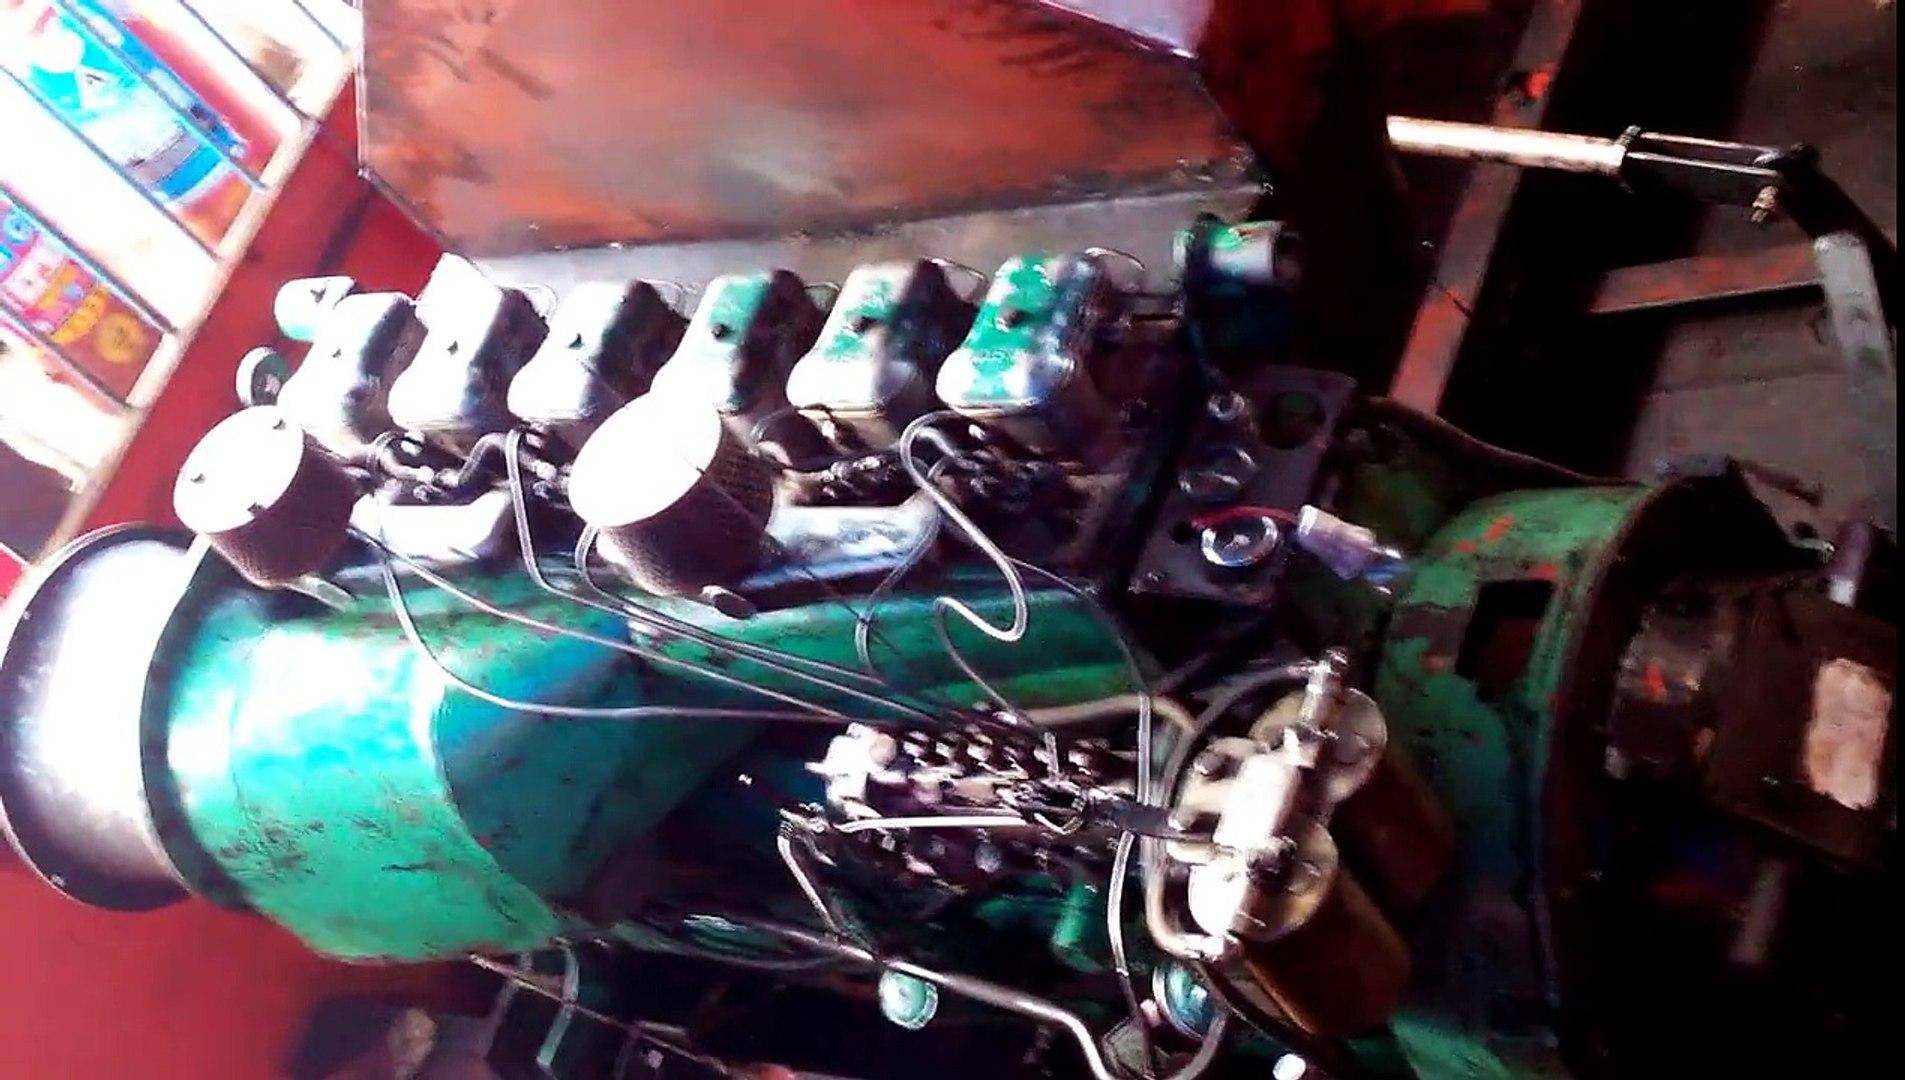 ZUARI PNJ-462 Ferry RUSTON & HORNSBY (INDIA LTD...) 6YDAXM-(MK.2) Engine Room In Action...